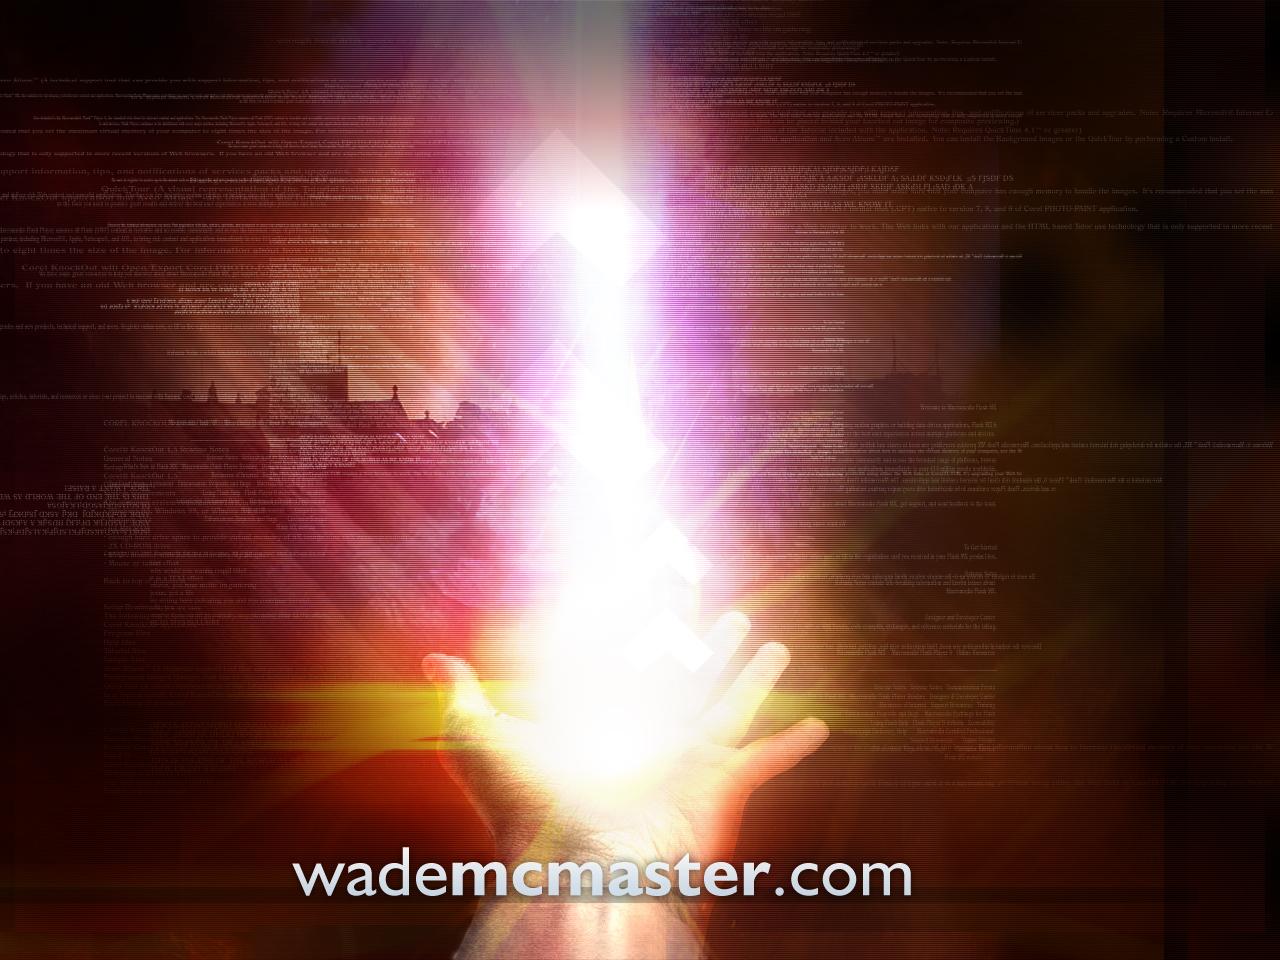 wademcmaster.com